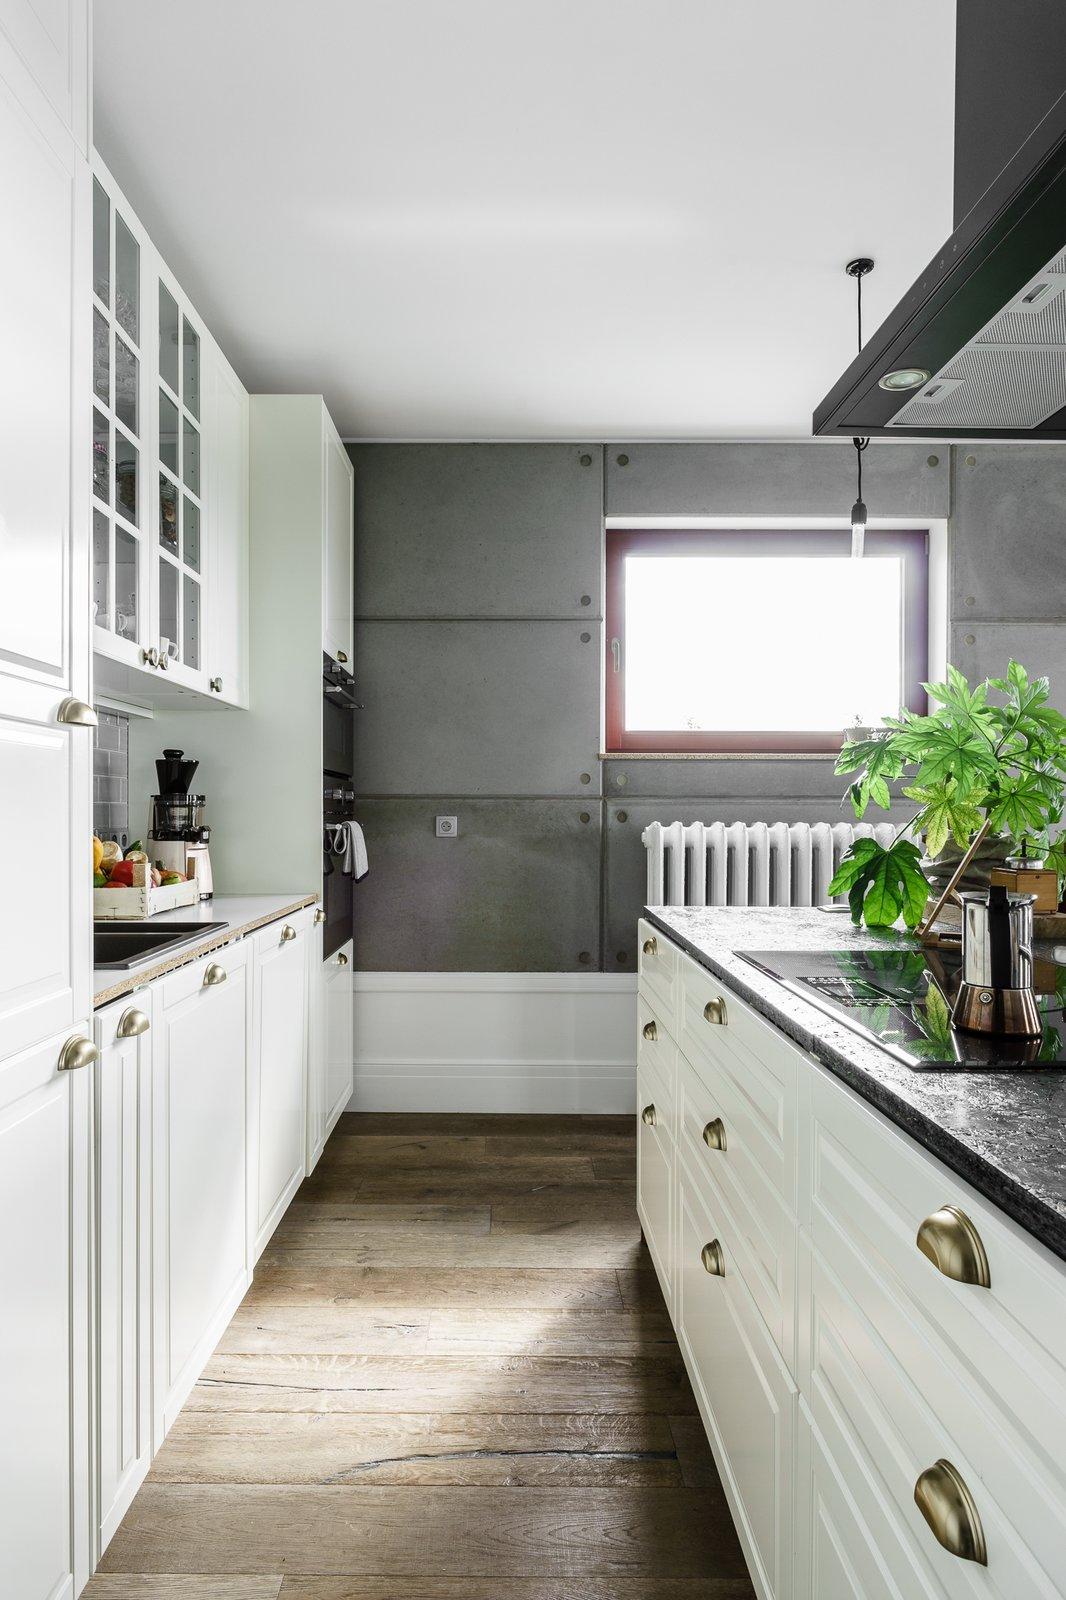 Kitchen, Cooktops, White Cabinet, Granite Counter, Medium Hardwood Floor, Range Hood, and Drop In Sink  Loft in Poland